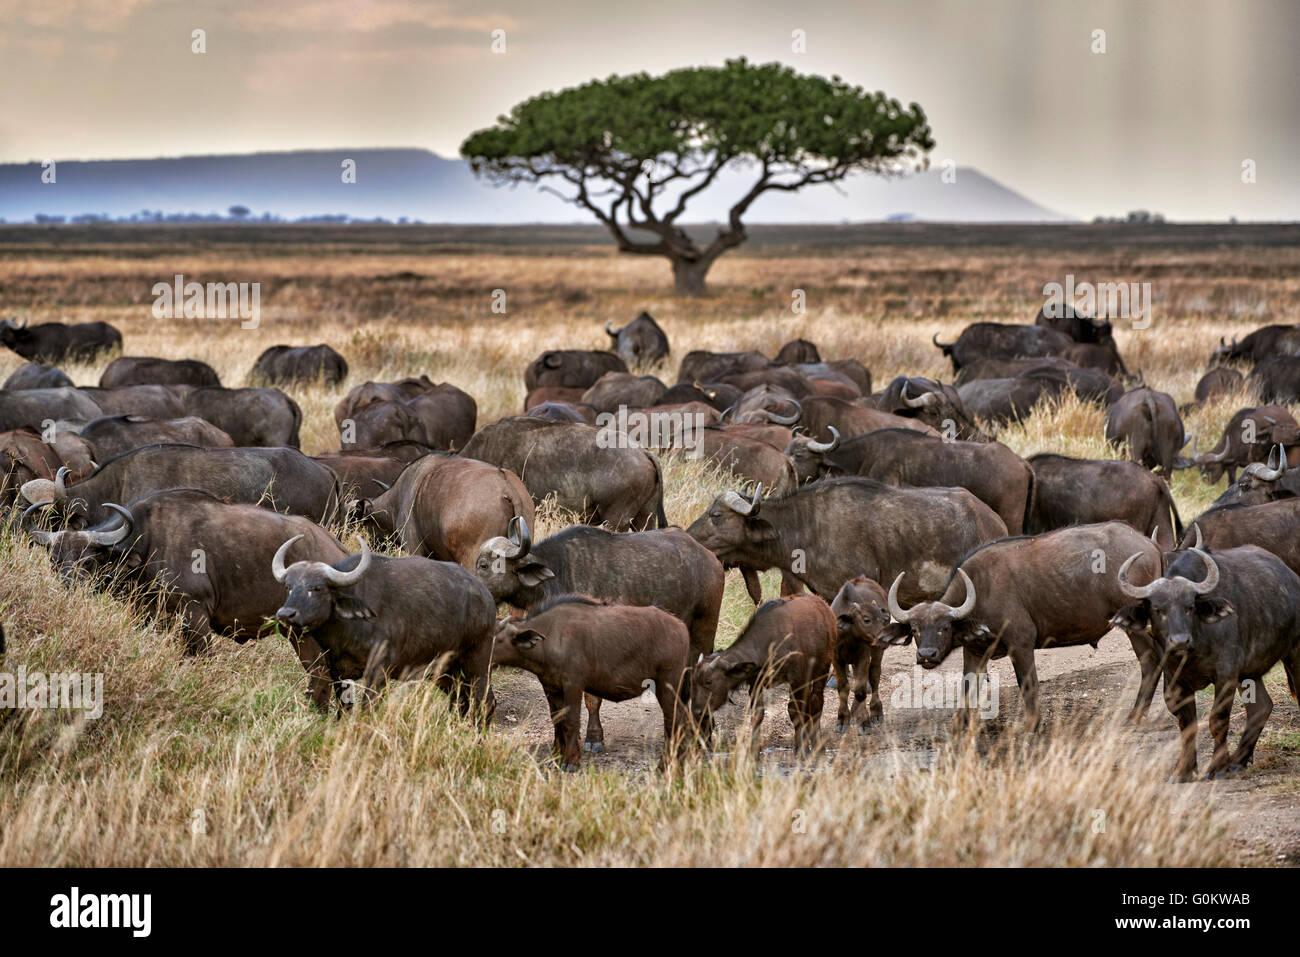 Herde von afrikanische Büffel (Syncerus Caffer) bei Sonnenuntergang im Serengeti National Park, UNESCO-Weltkulturerbe, Stockbild